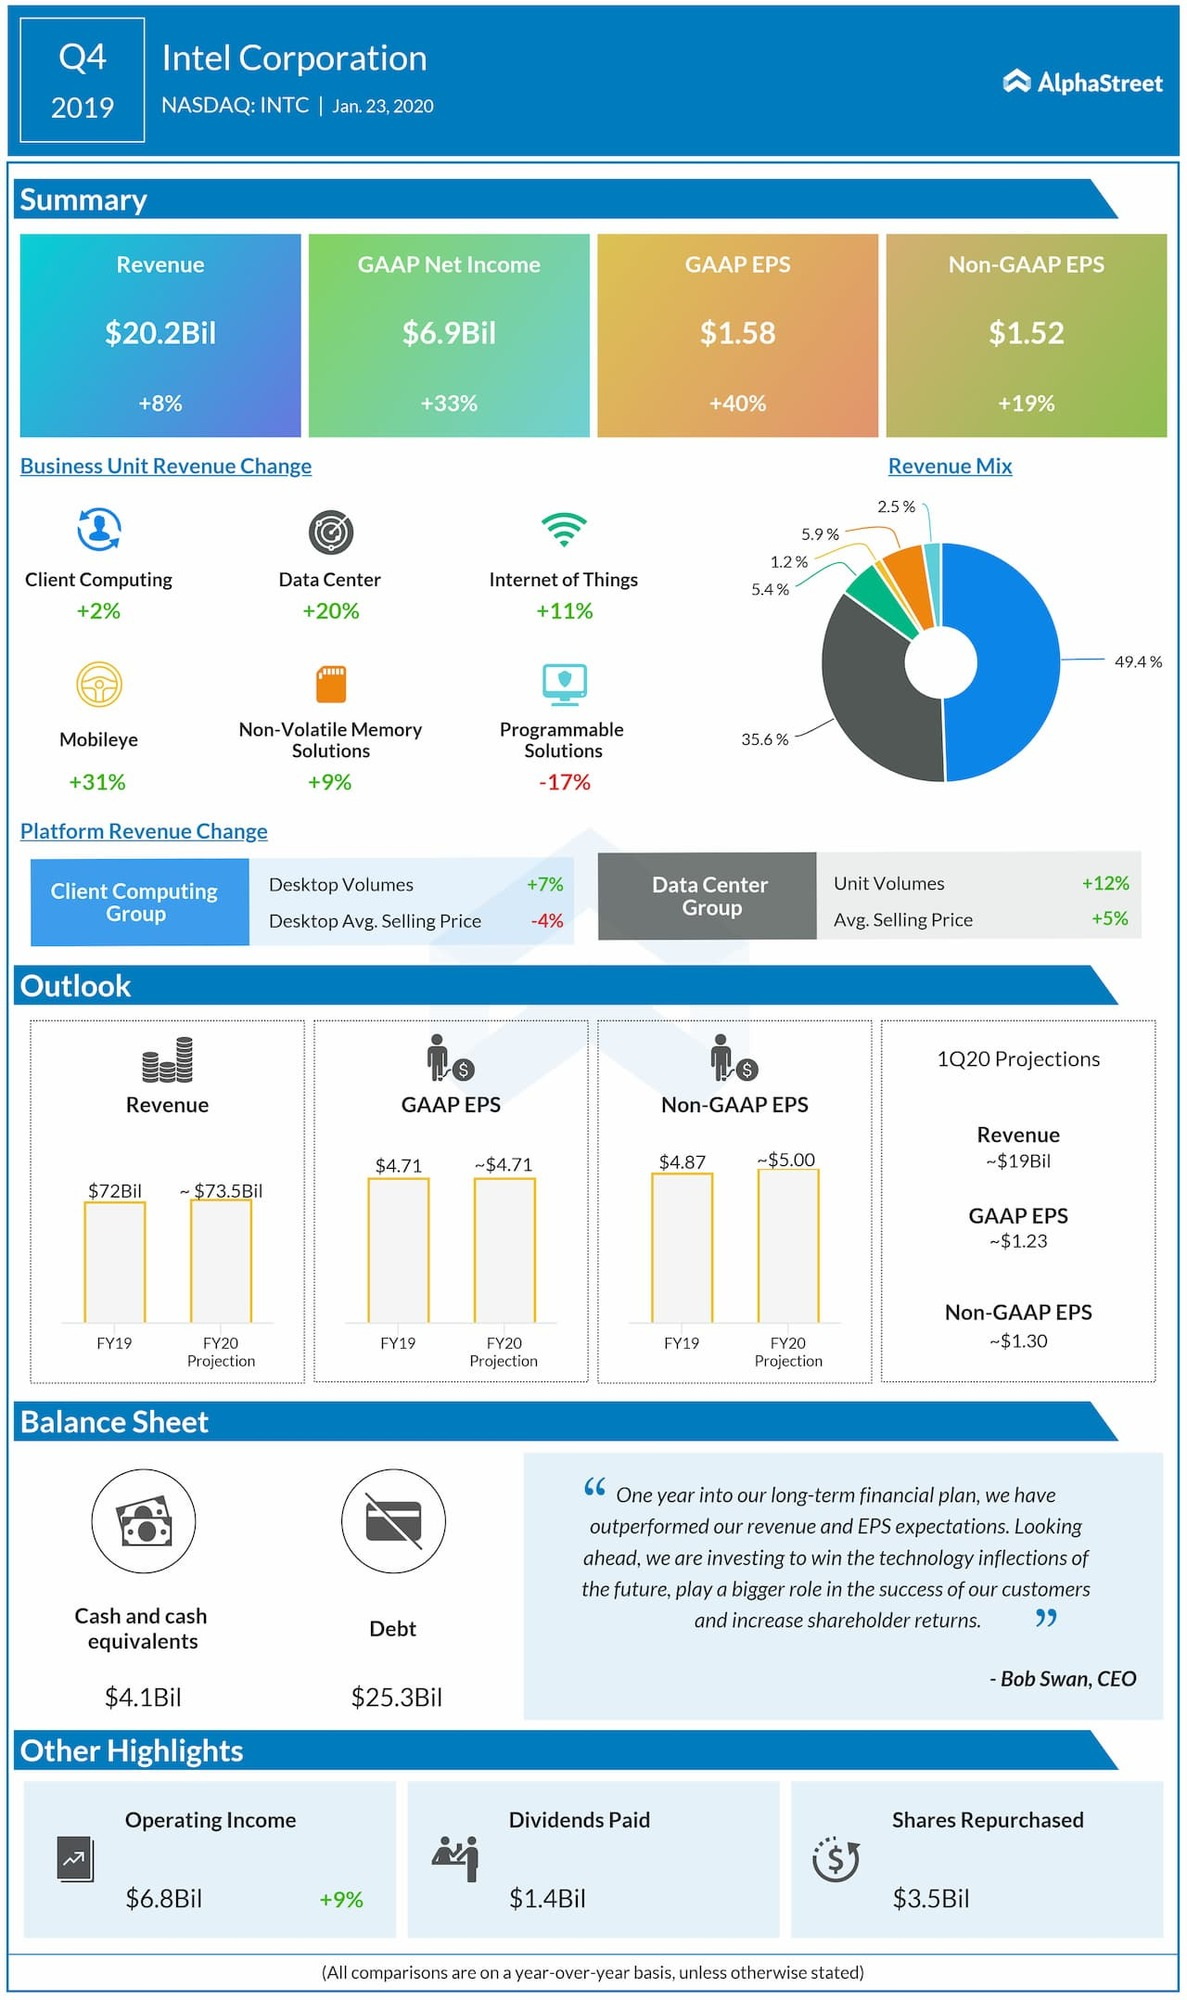 Intel-Q4-2019-Earnings-Infographic.jpg